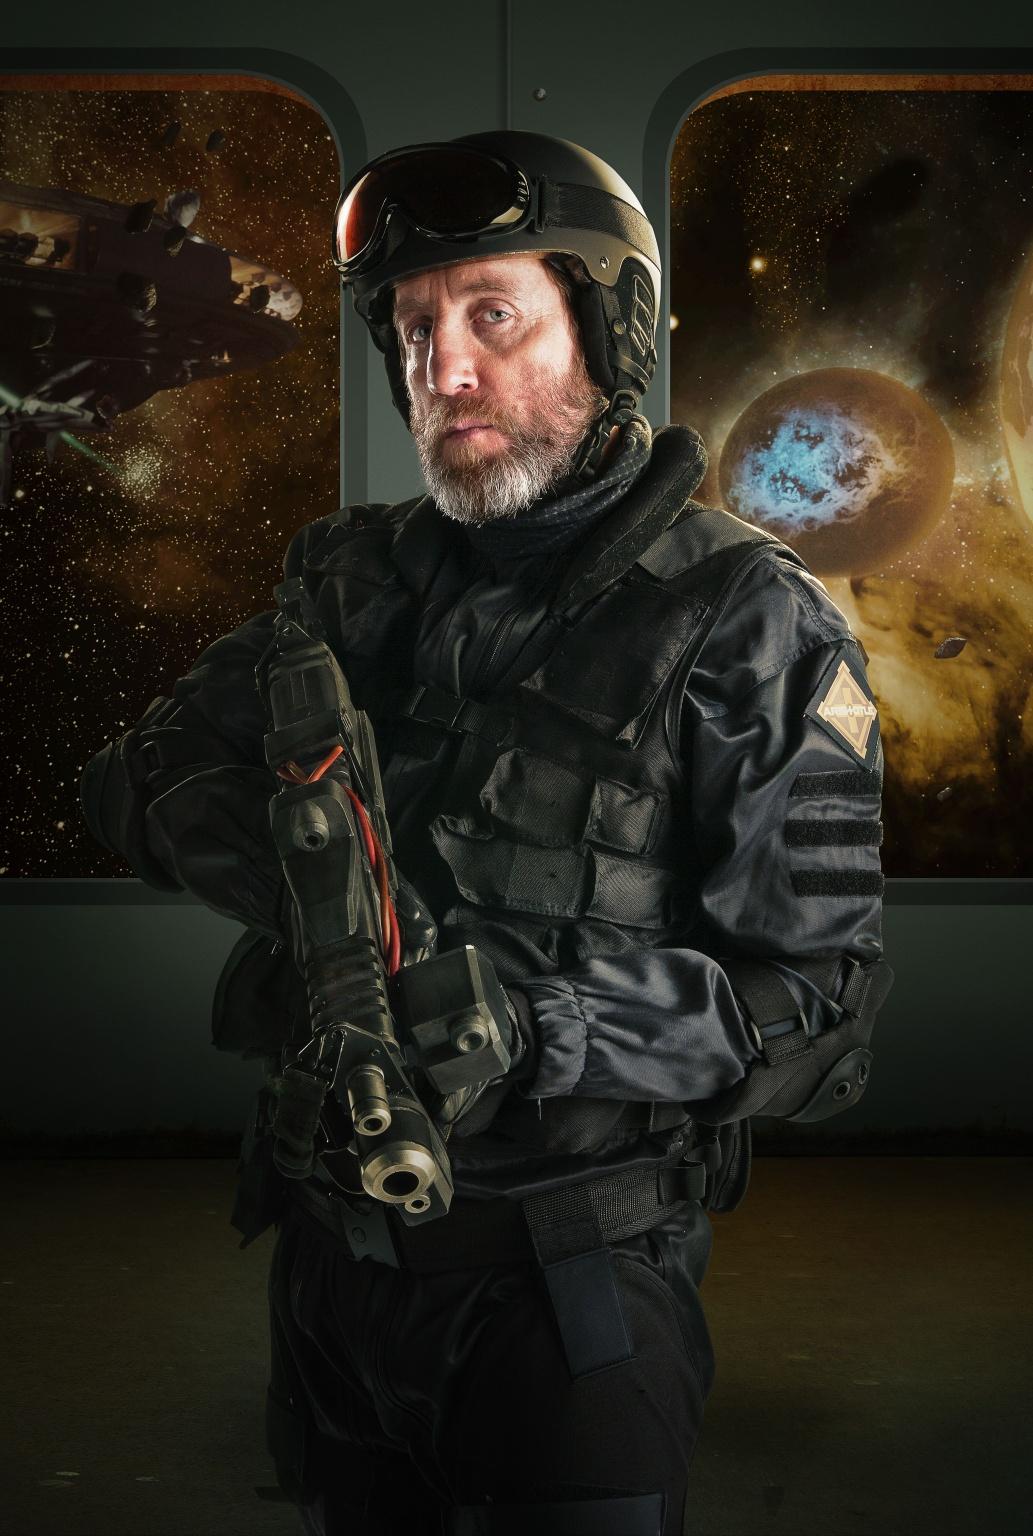 Michael Ashton as Colonel Morgan Blue